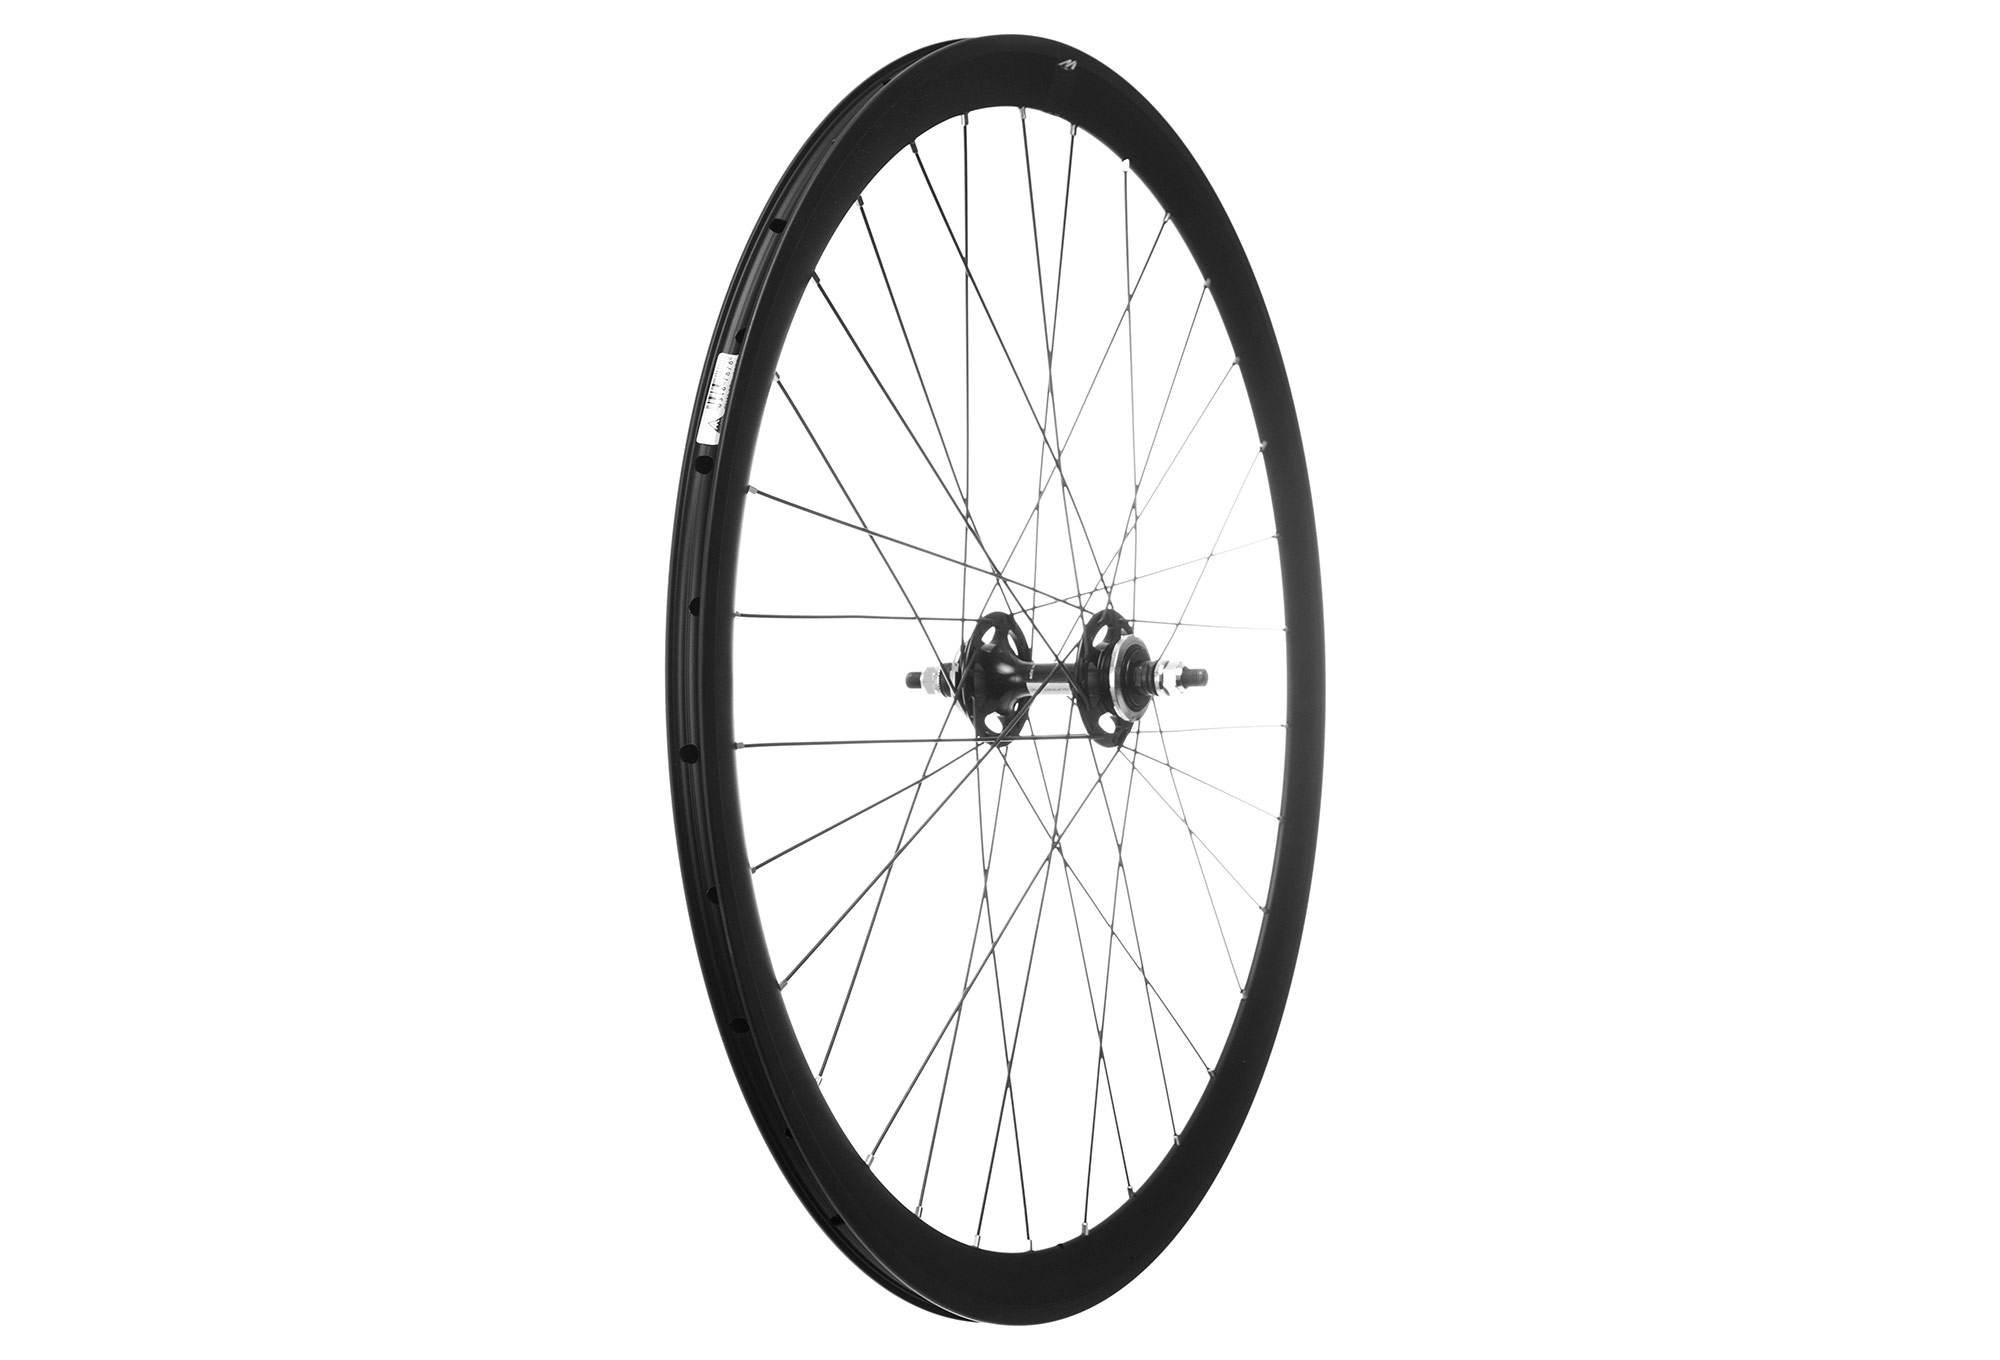 Miche Rear Wheel Wr Pistard Full Black Tires Tubetype